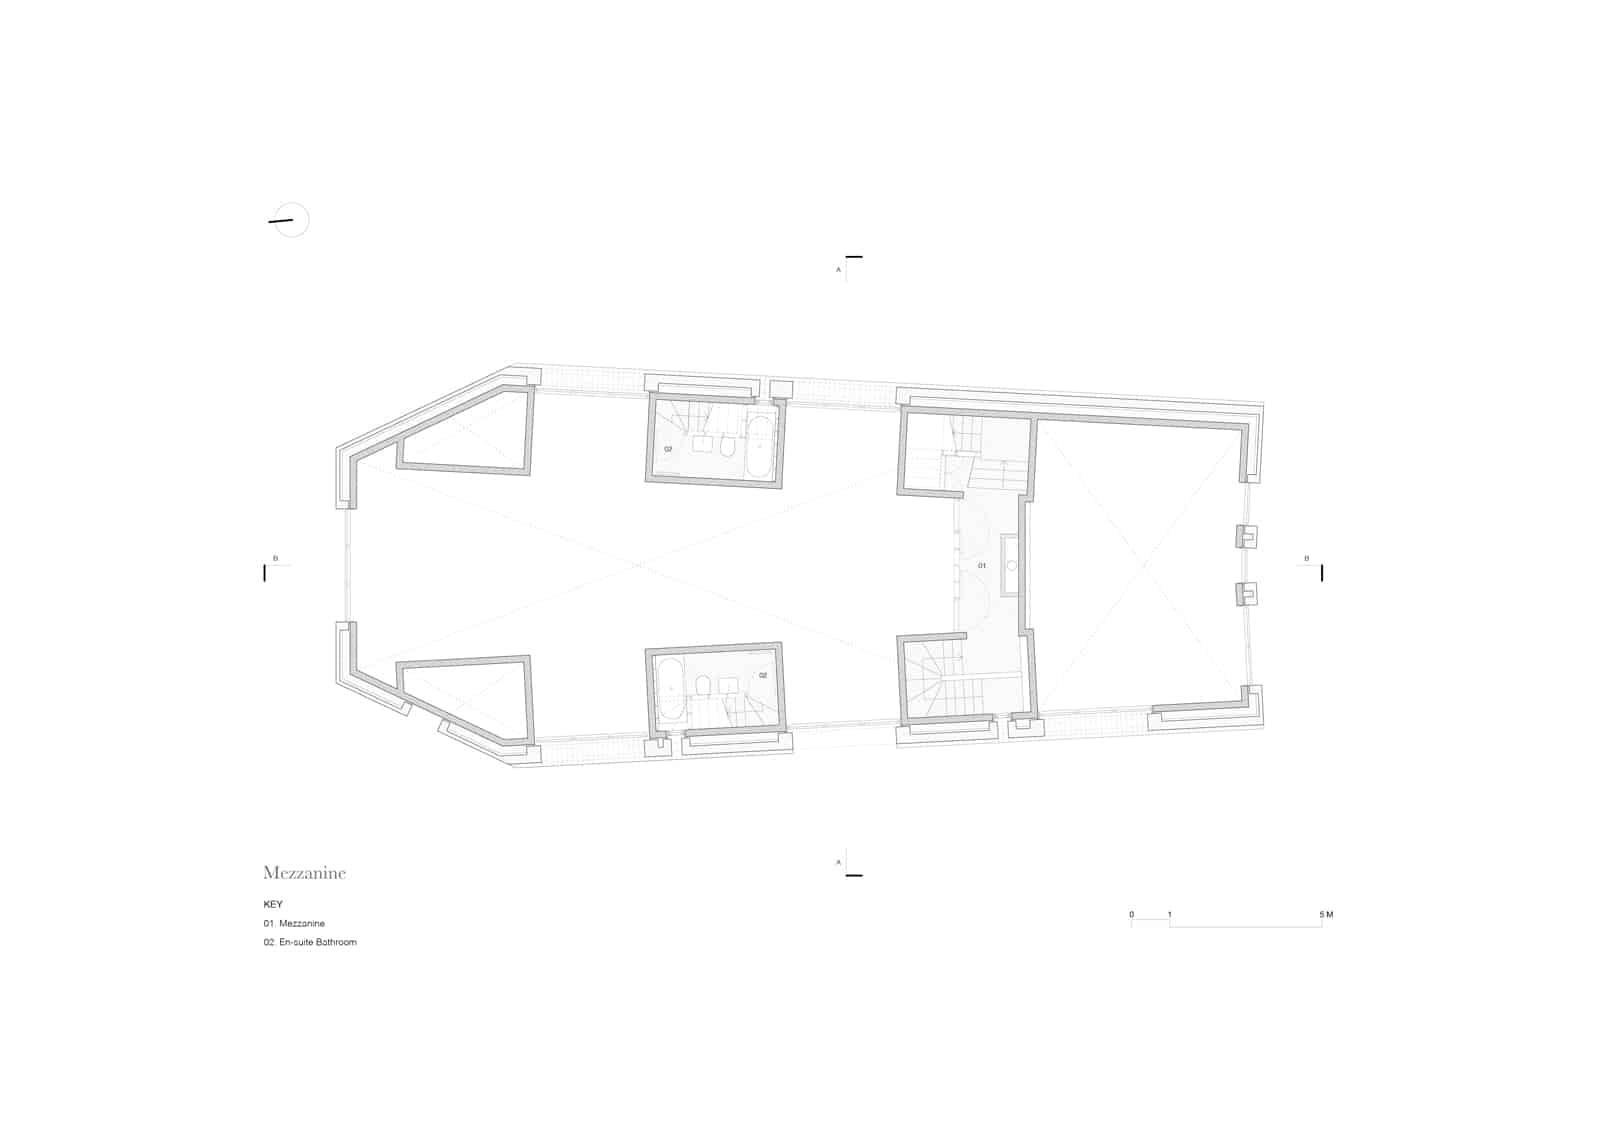 Nithurst Farm  - 20210802 ARA NithurstFarm 07.2.2 52